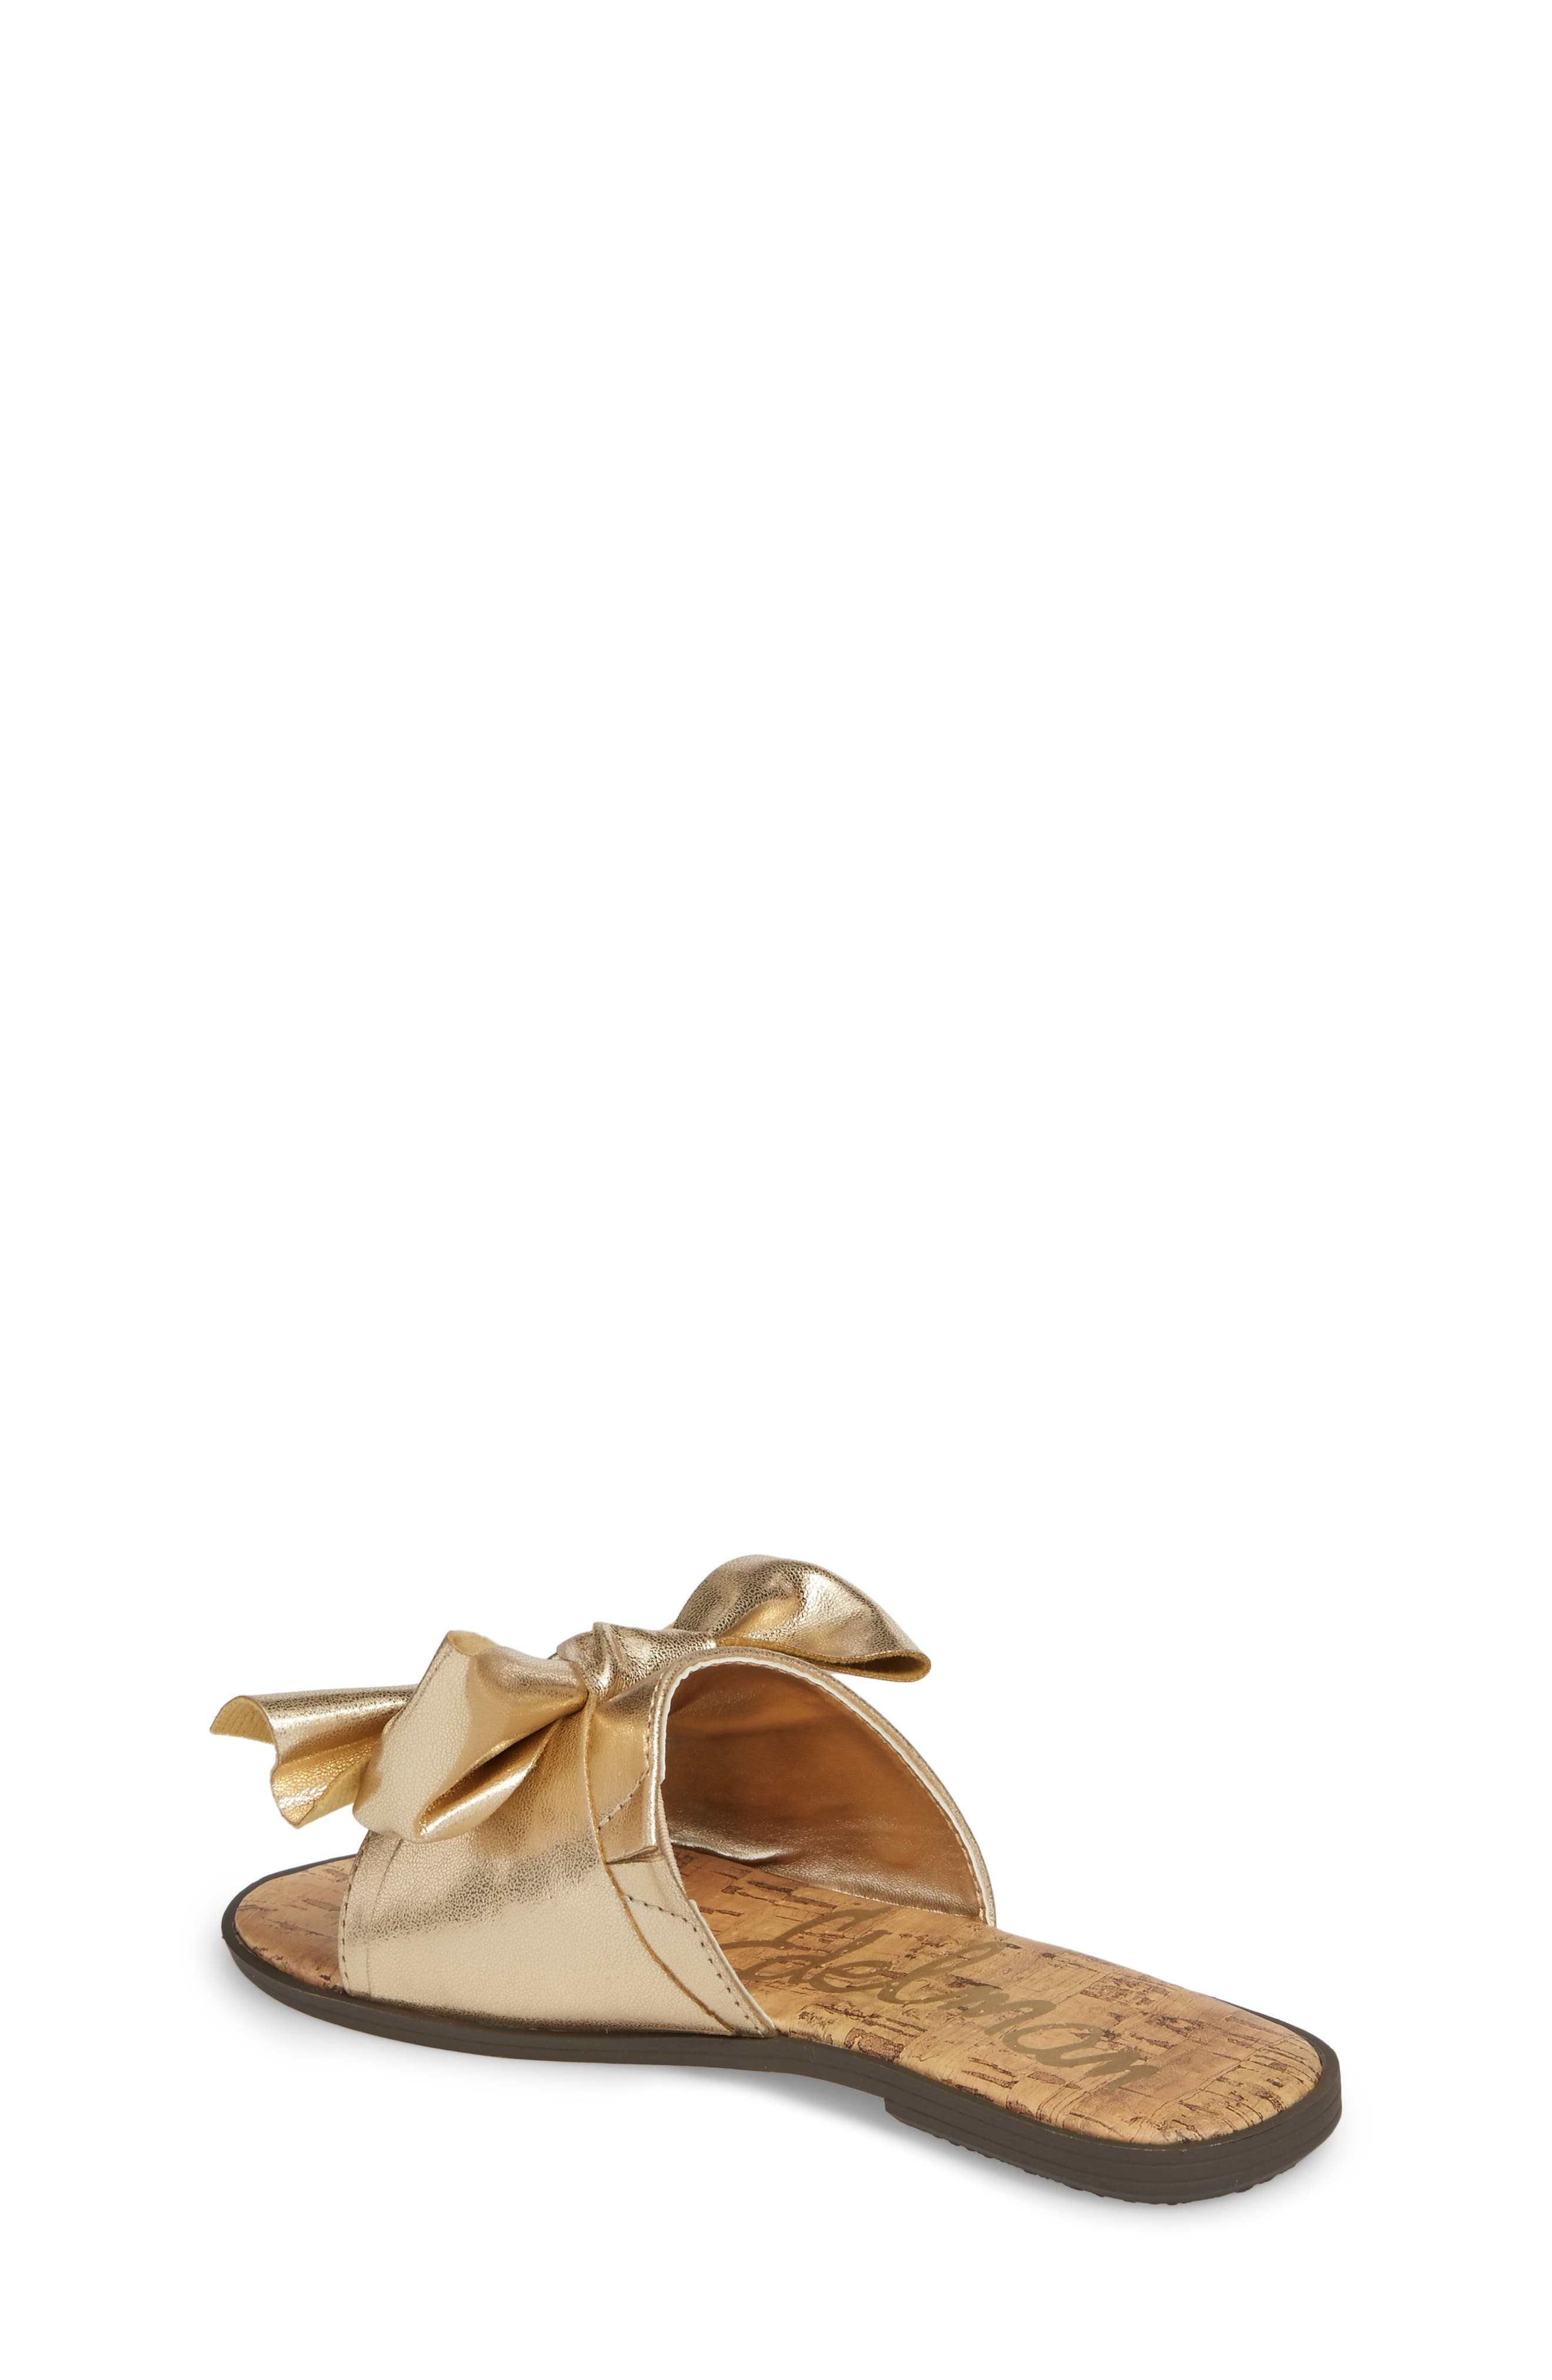 Gigi Bow Faux Leather Sandal,                             Alternate thumbnail 6, color,